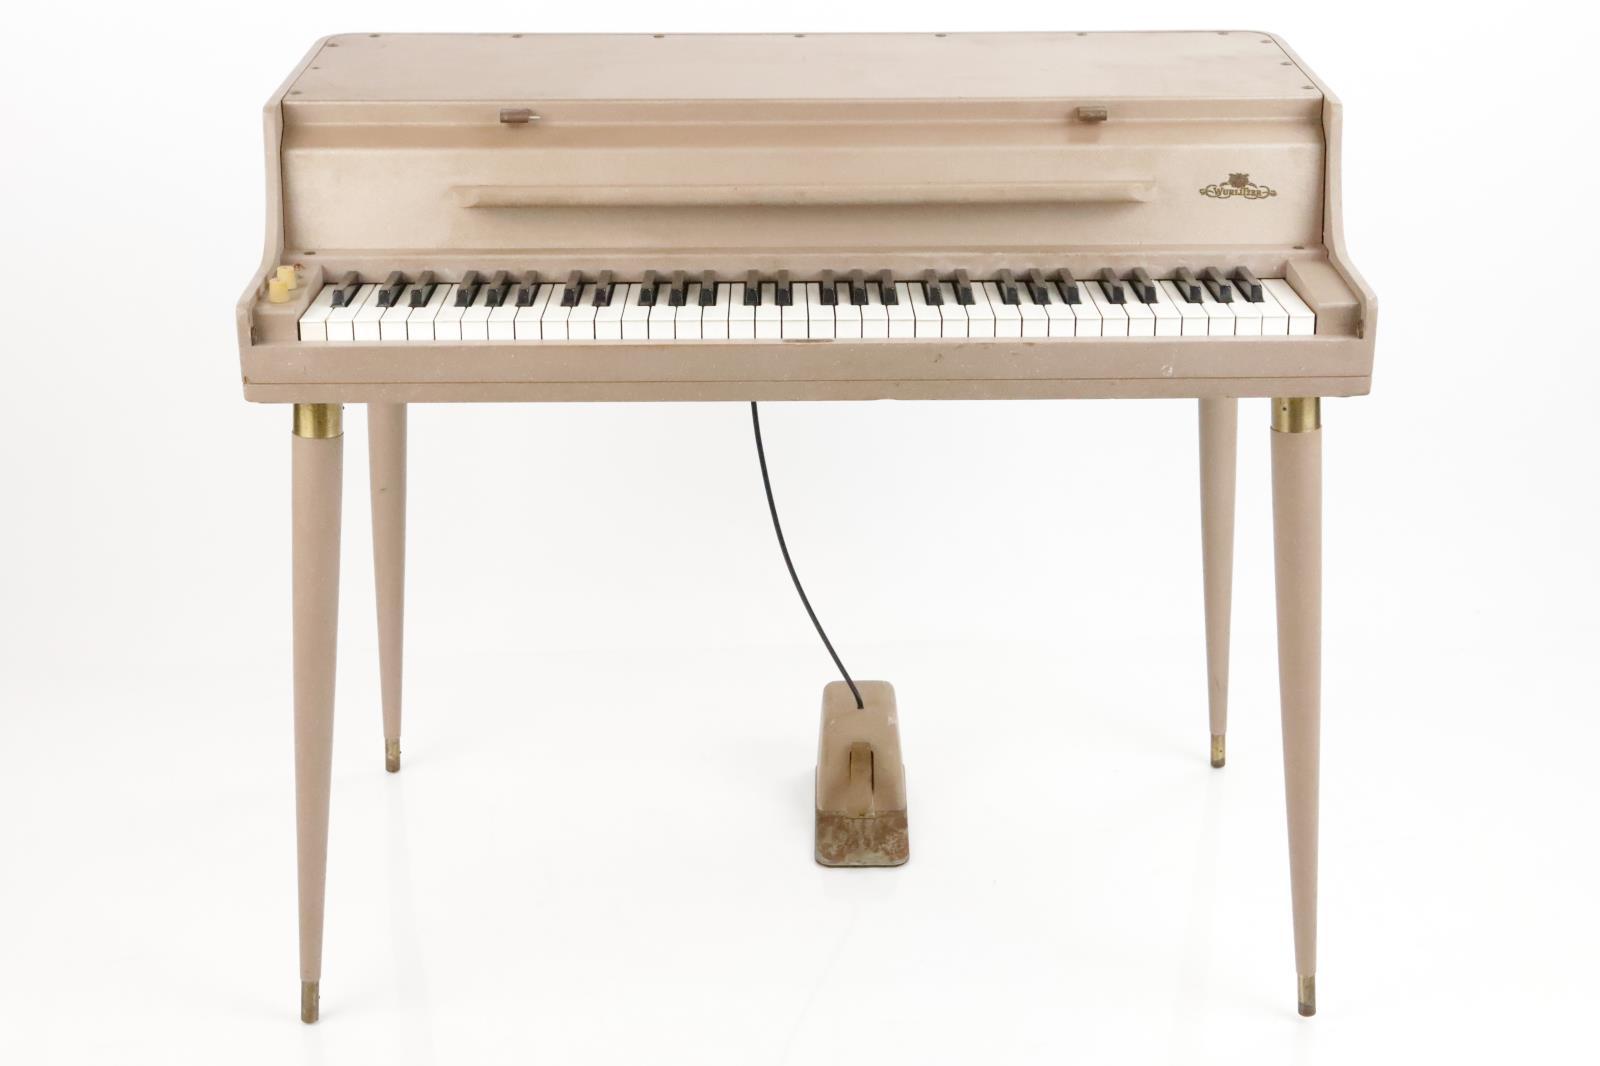 Wurlitzer Model 145B Tube Electric Piano w/ Sustain Pedal & Music Stand #35222